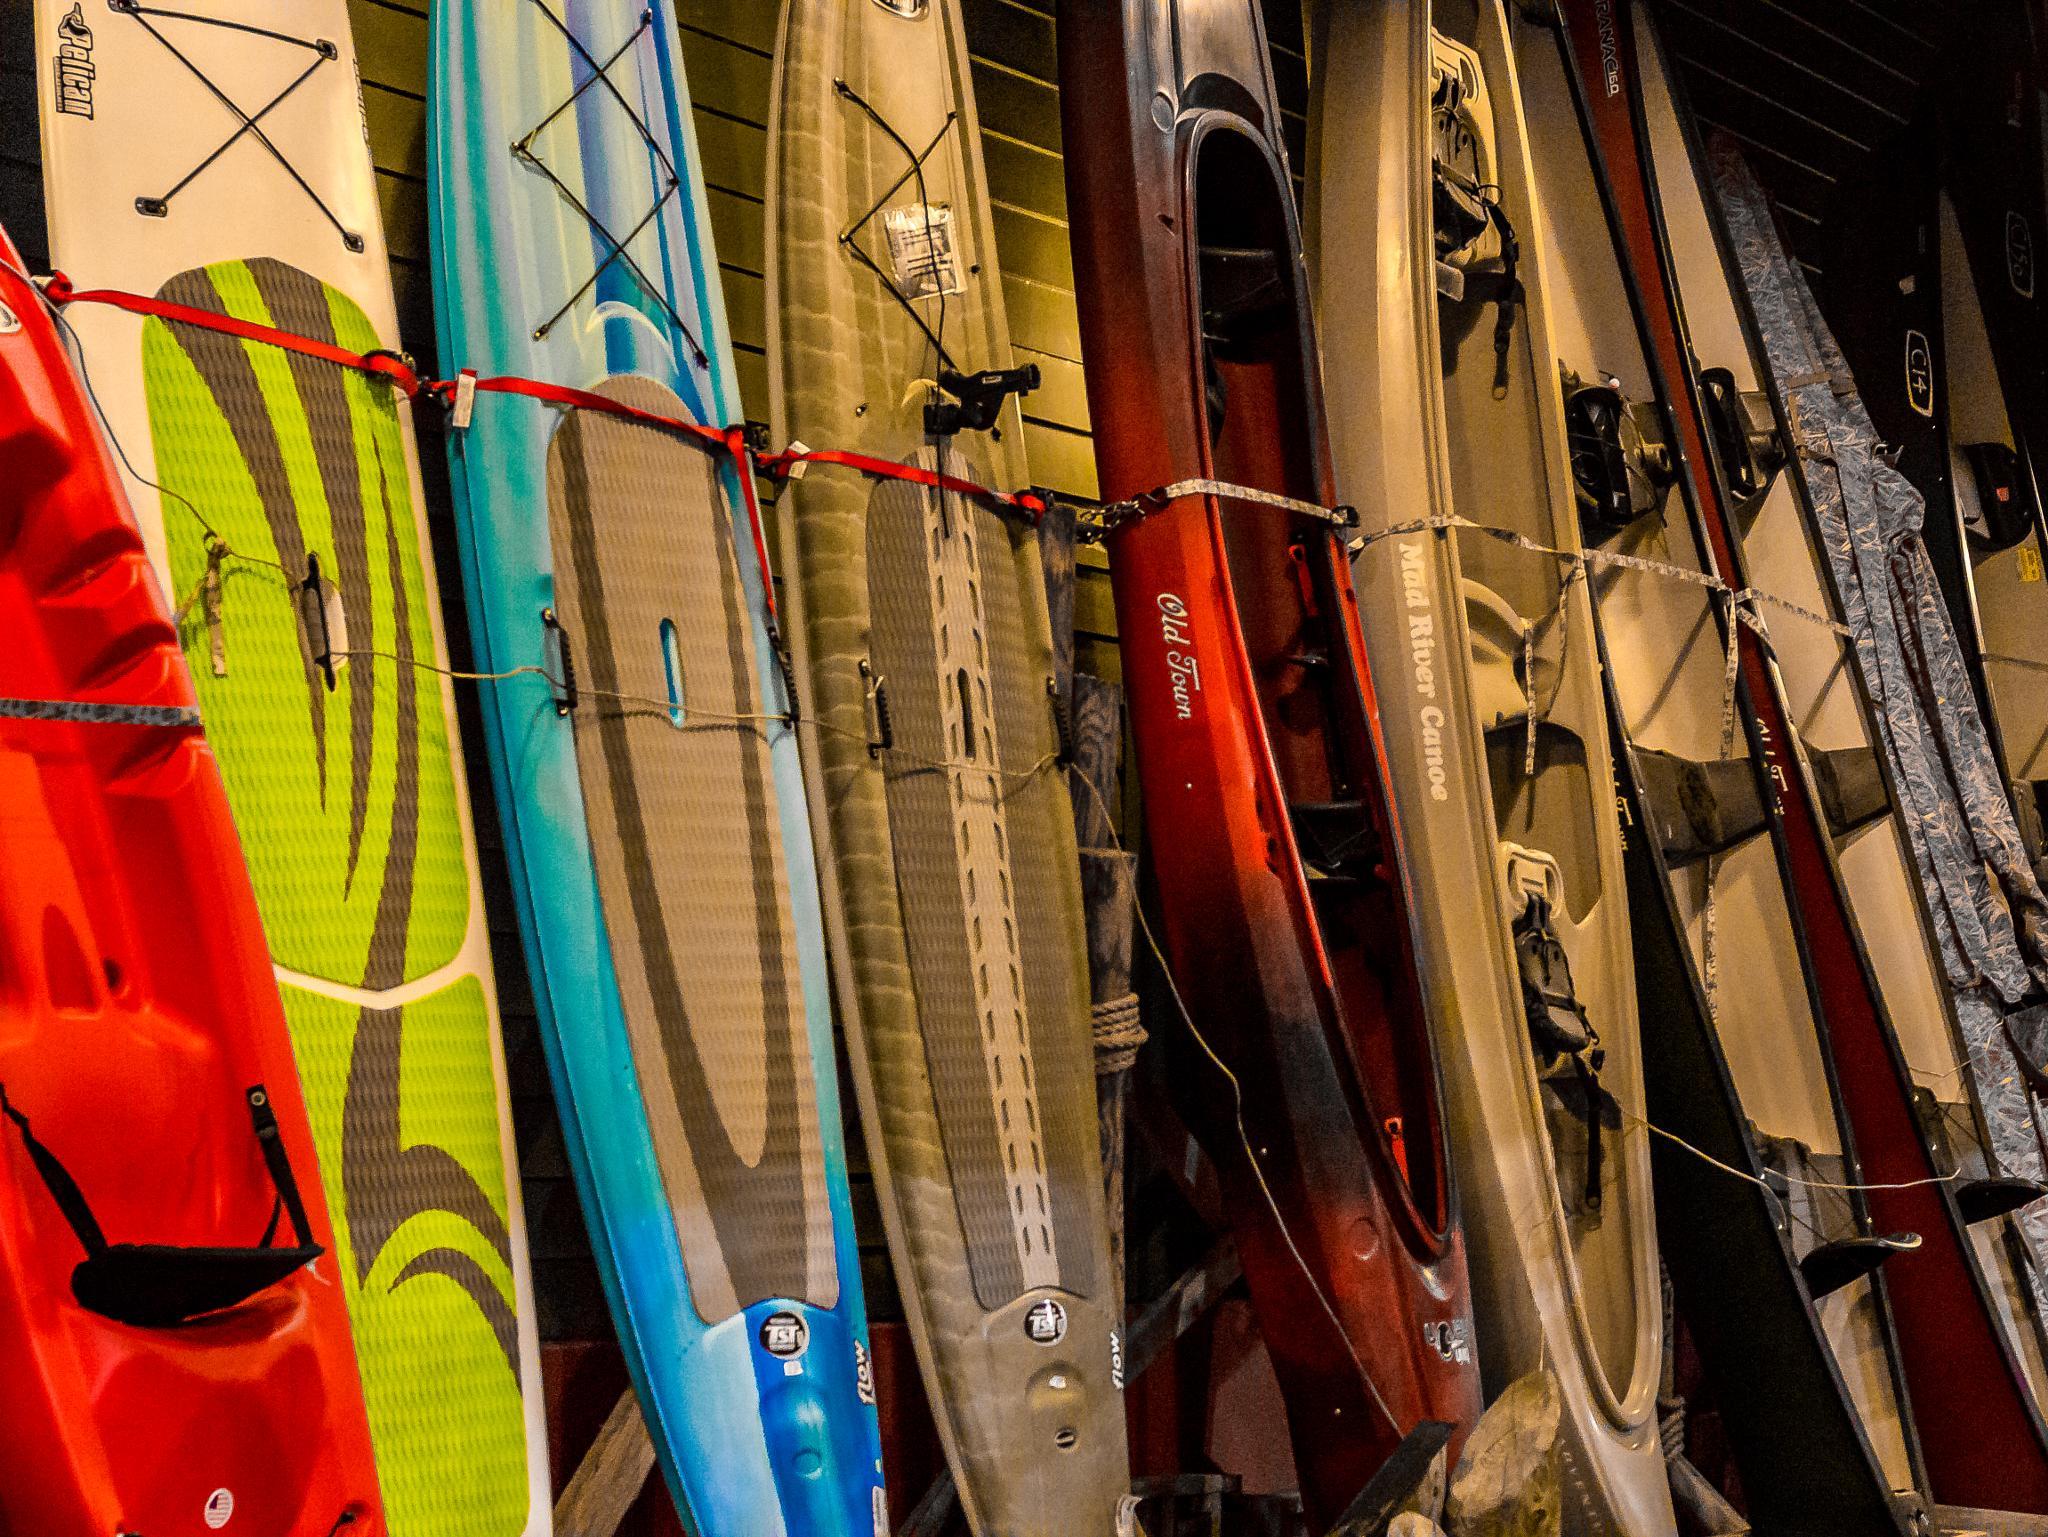 Kayaks by Michelle Eagan